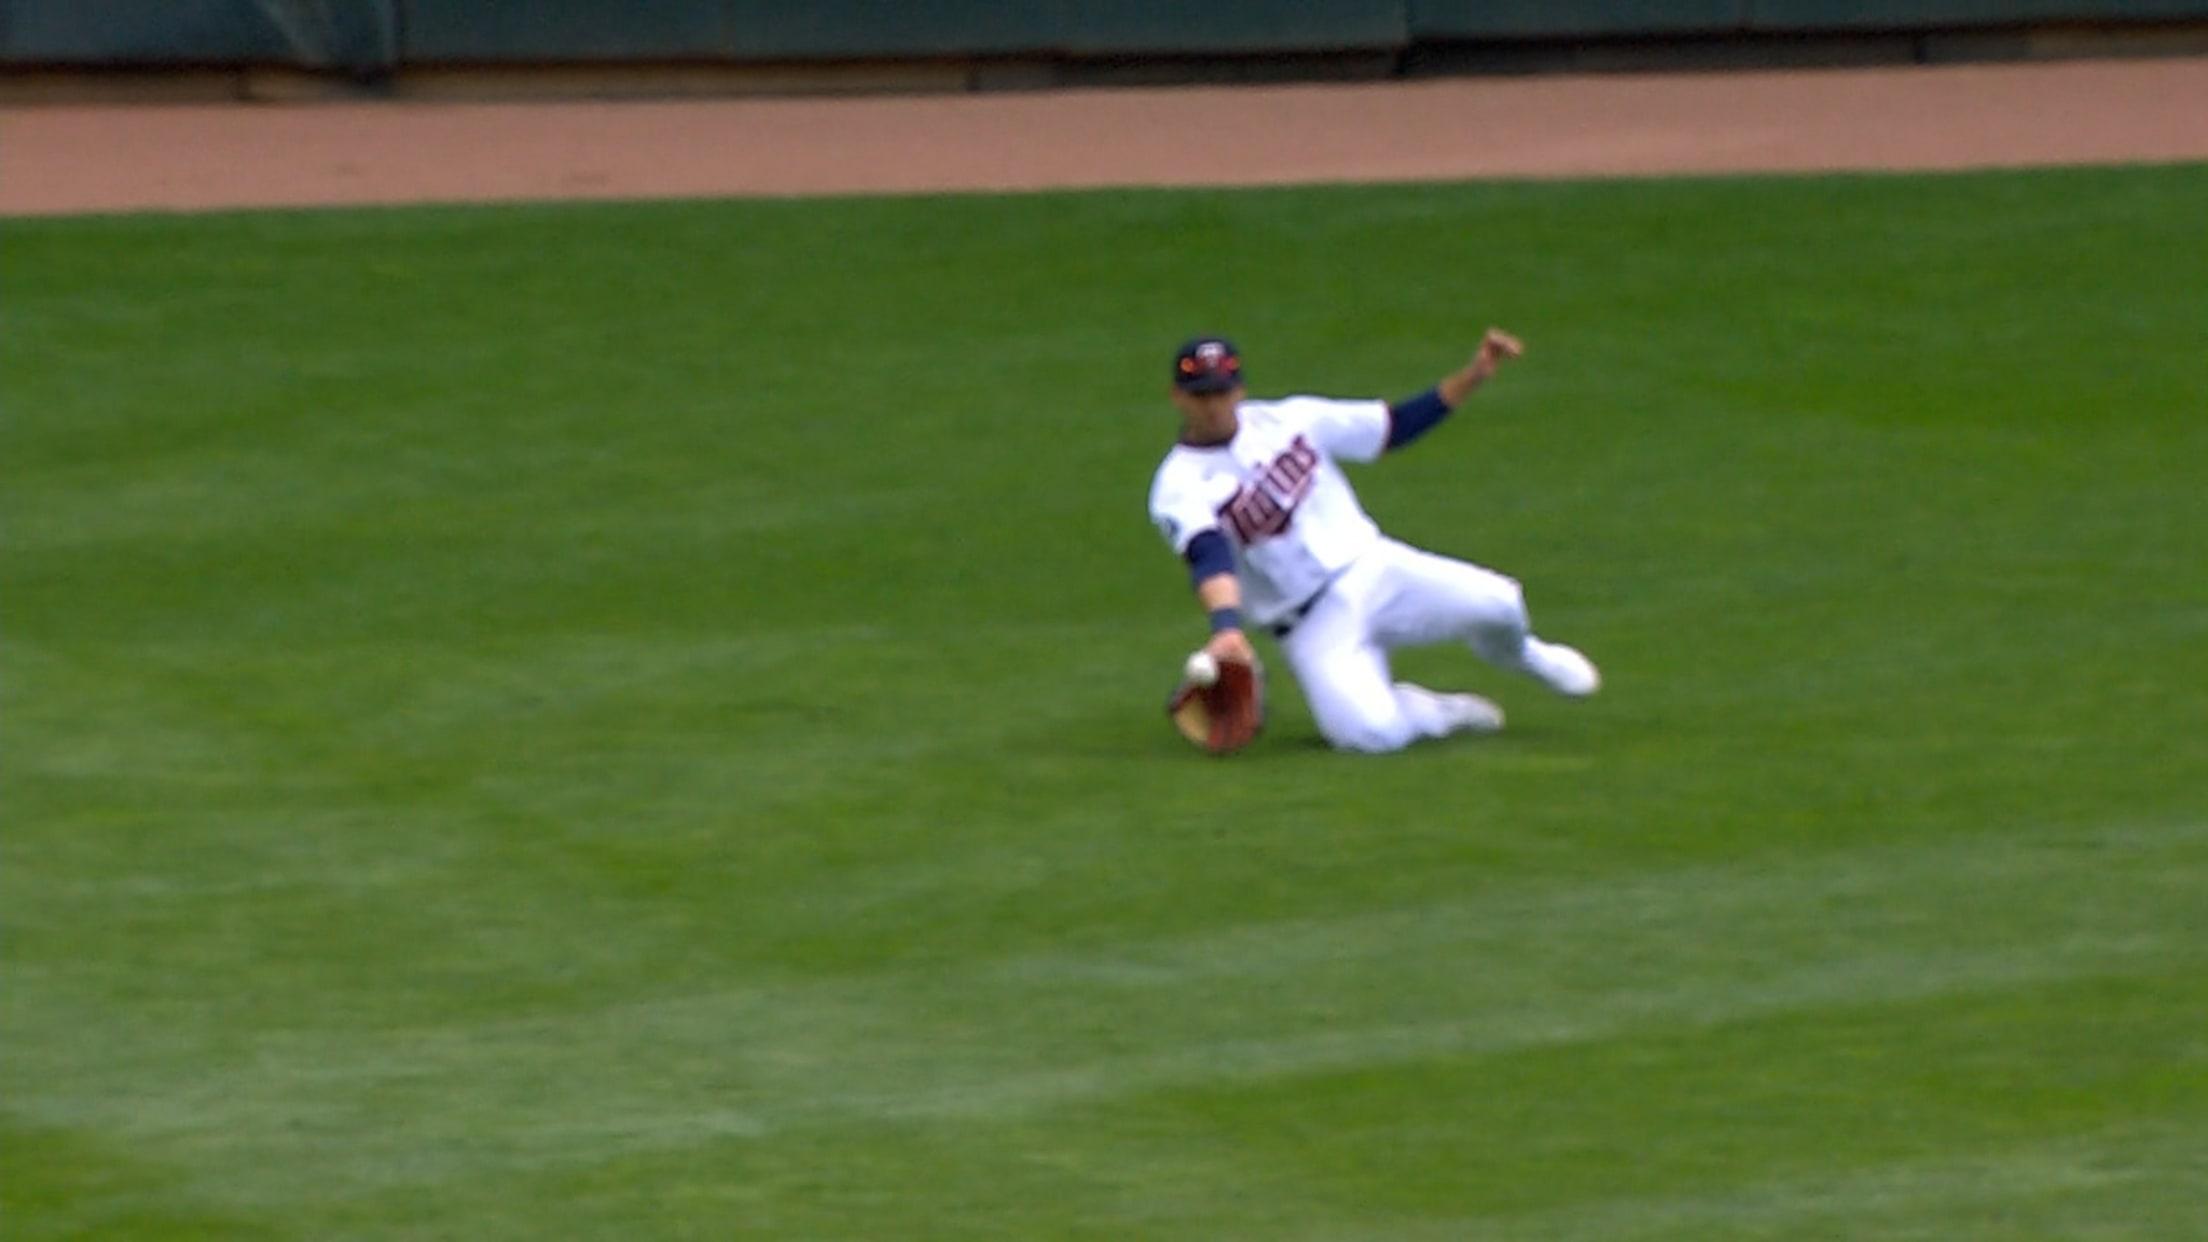 Alex Kirilloff's sliding catch